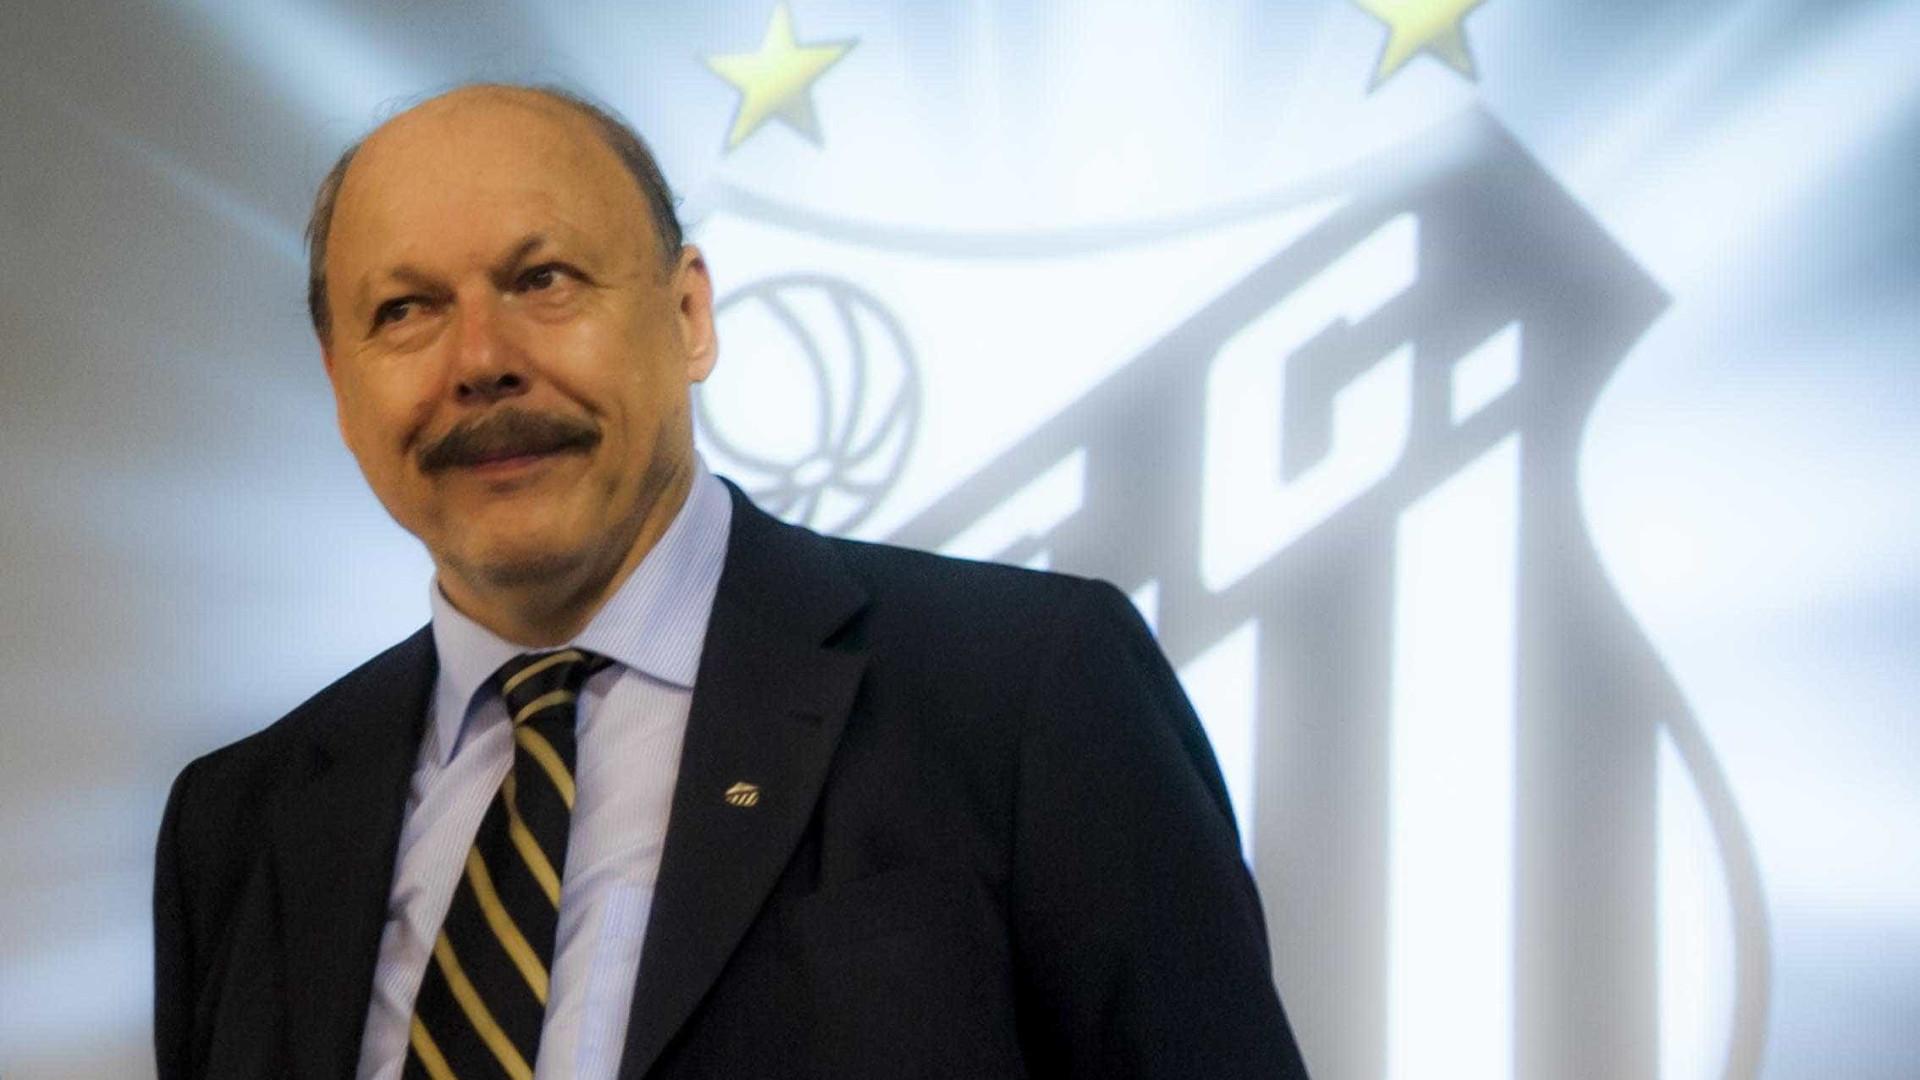 Presidente santista rebate acusações e ataca vice do clube